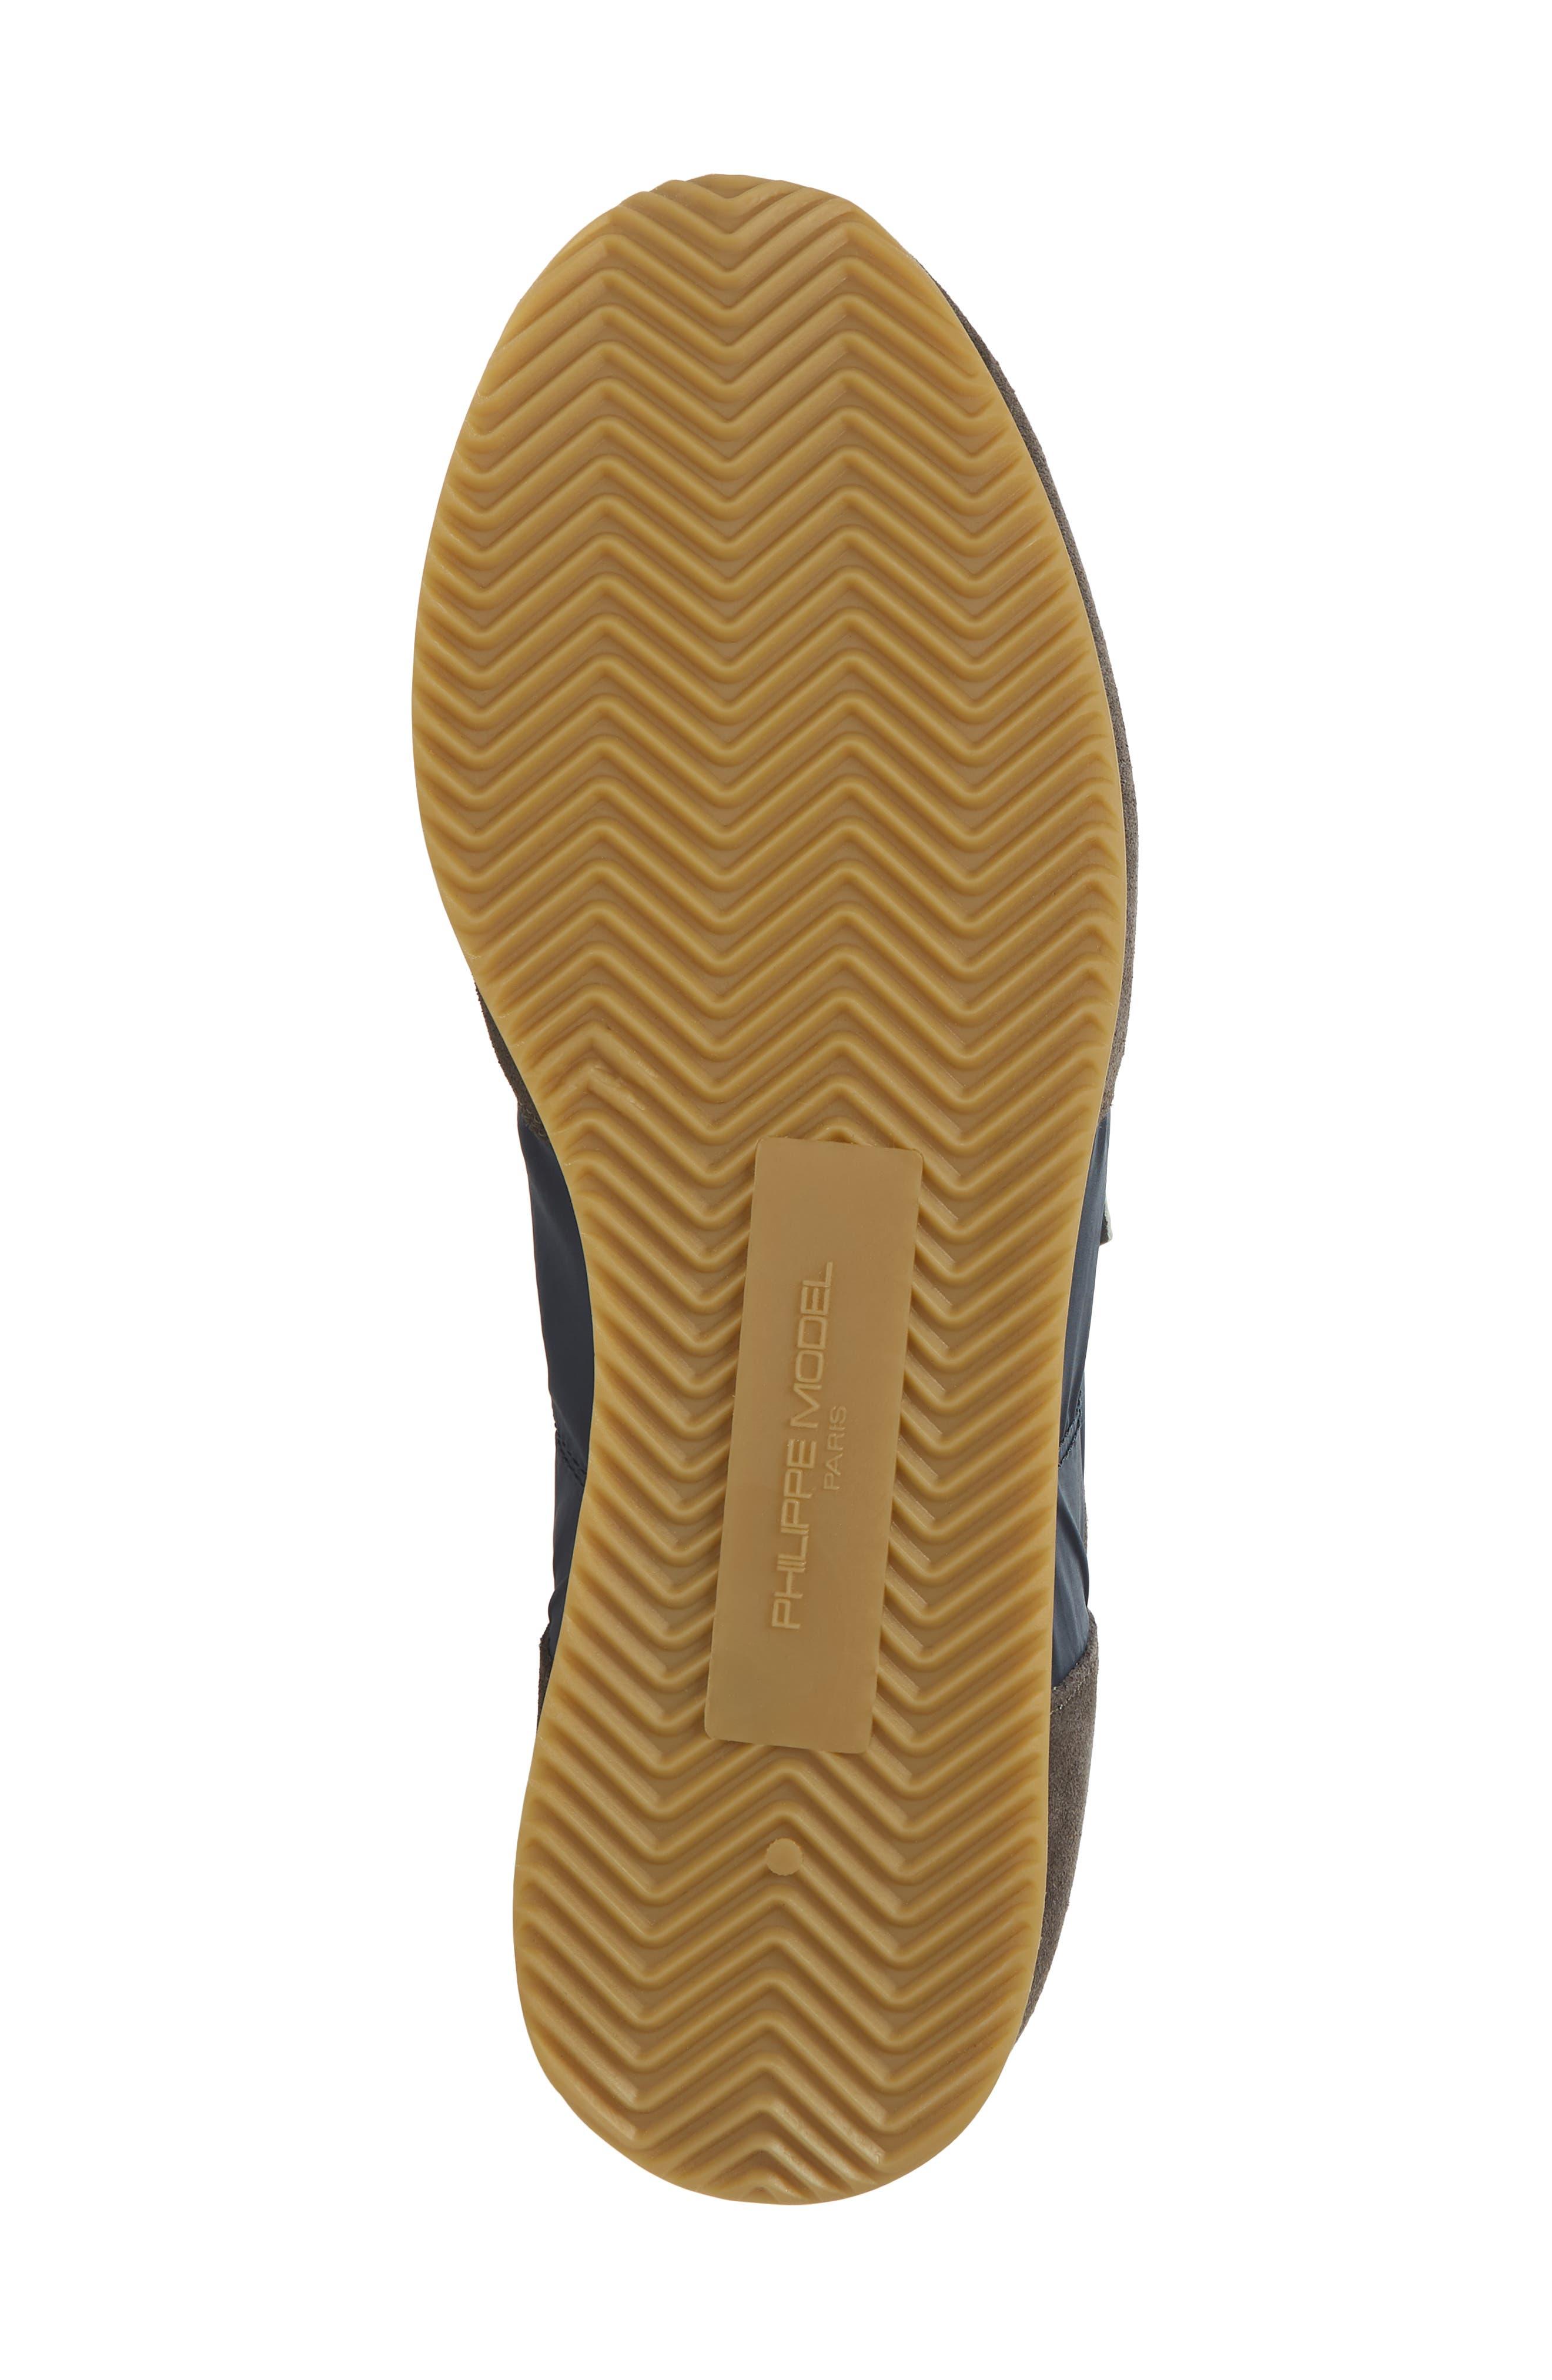 Tropez Low Top Sneaker,                             Alternate thumbnail 6, color,                             020